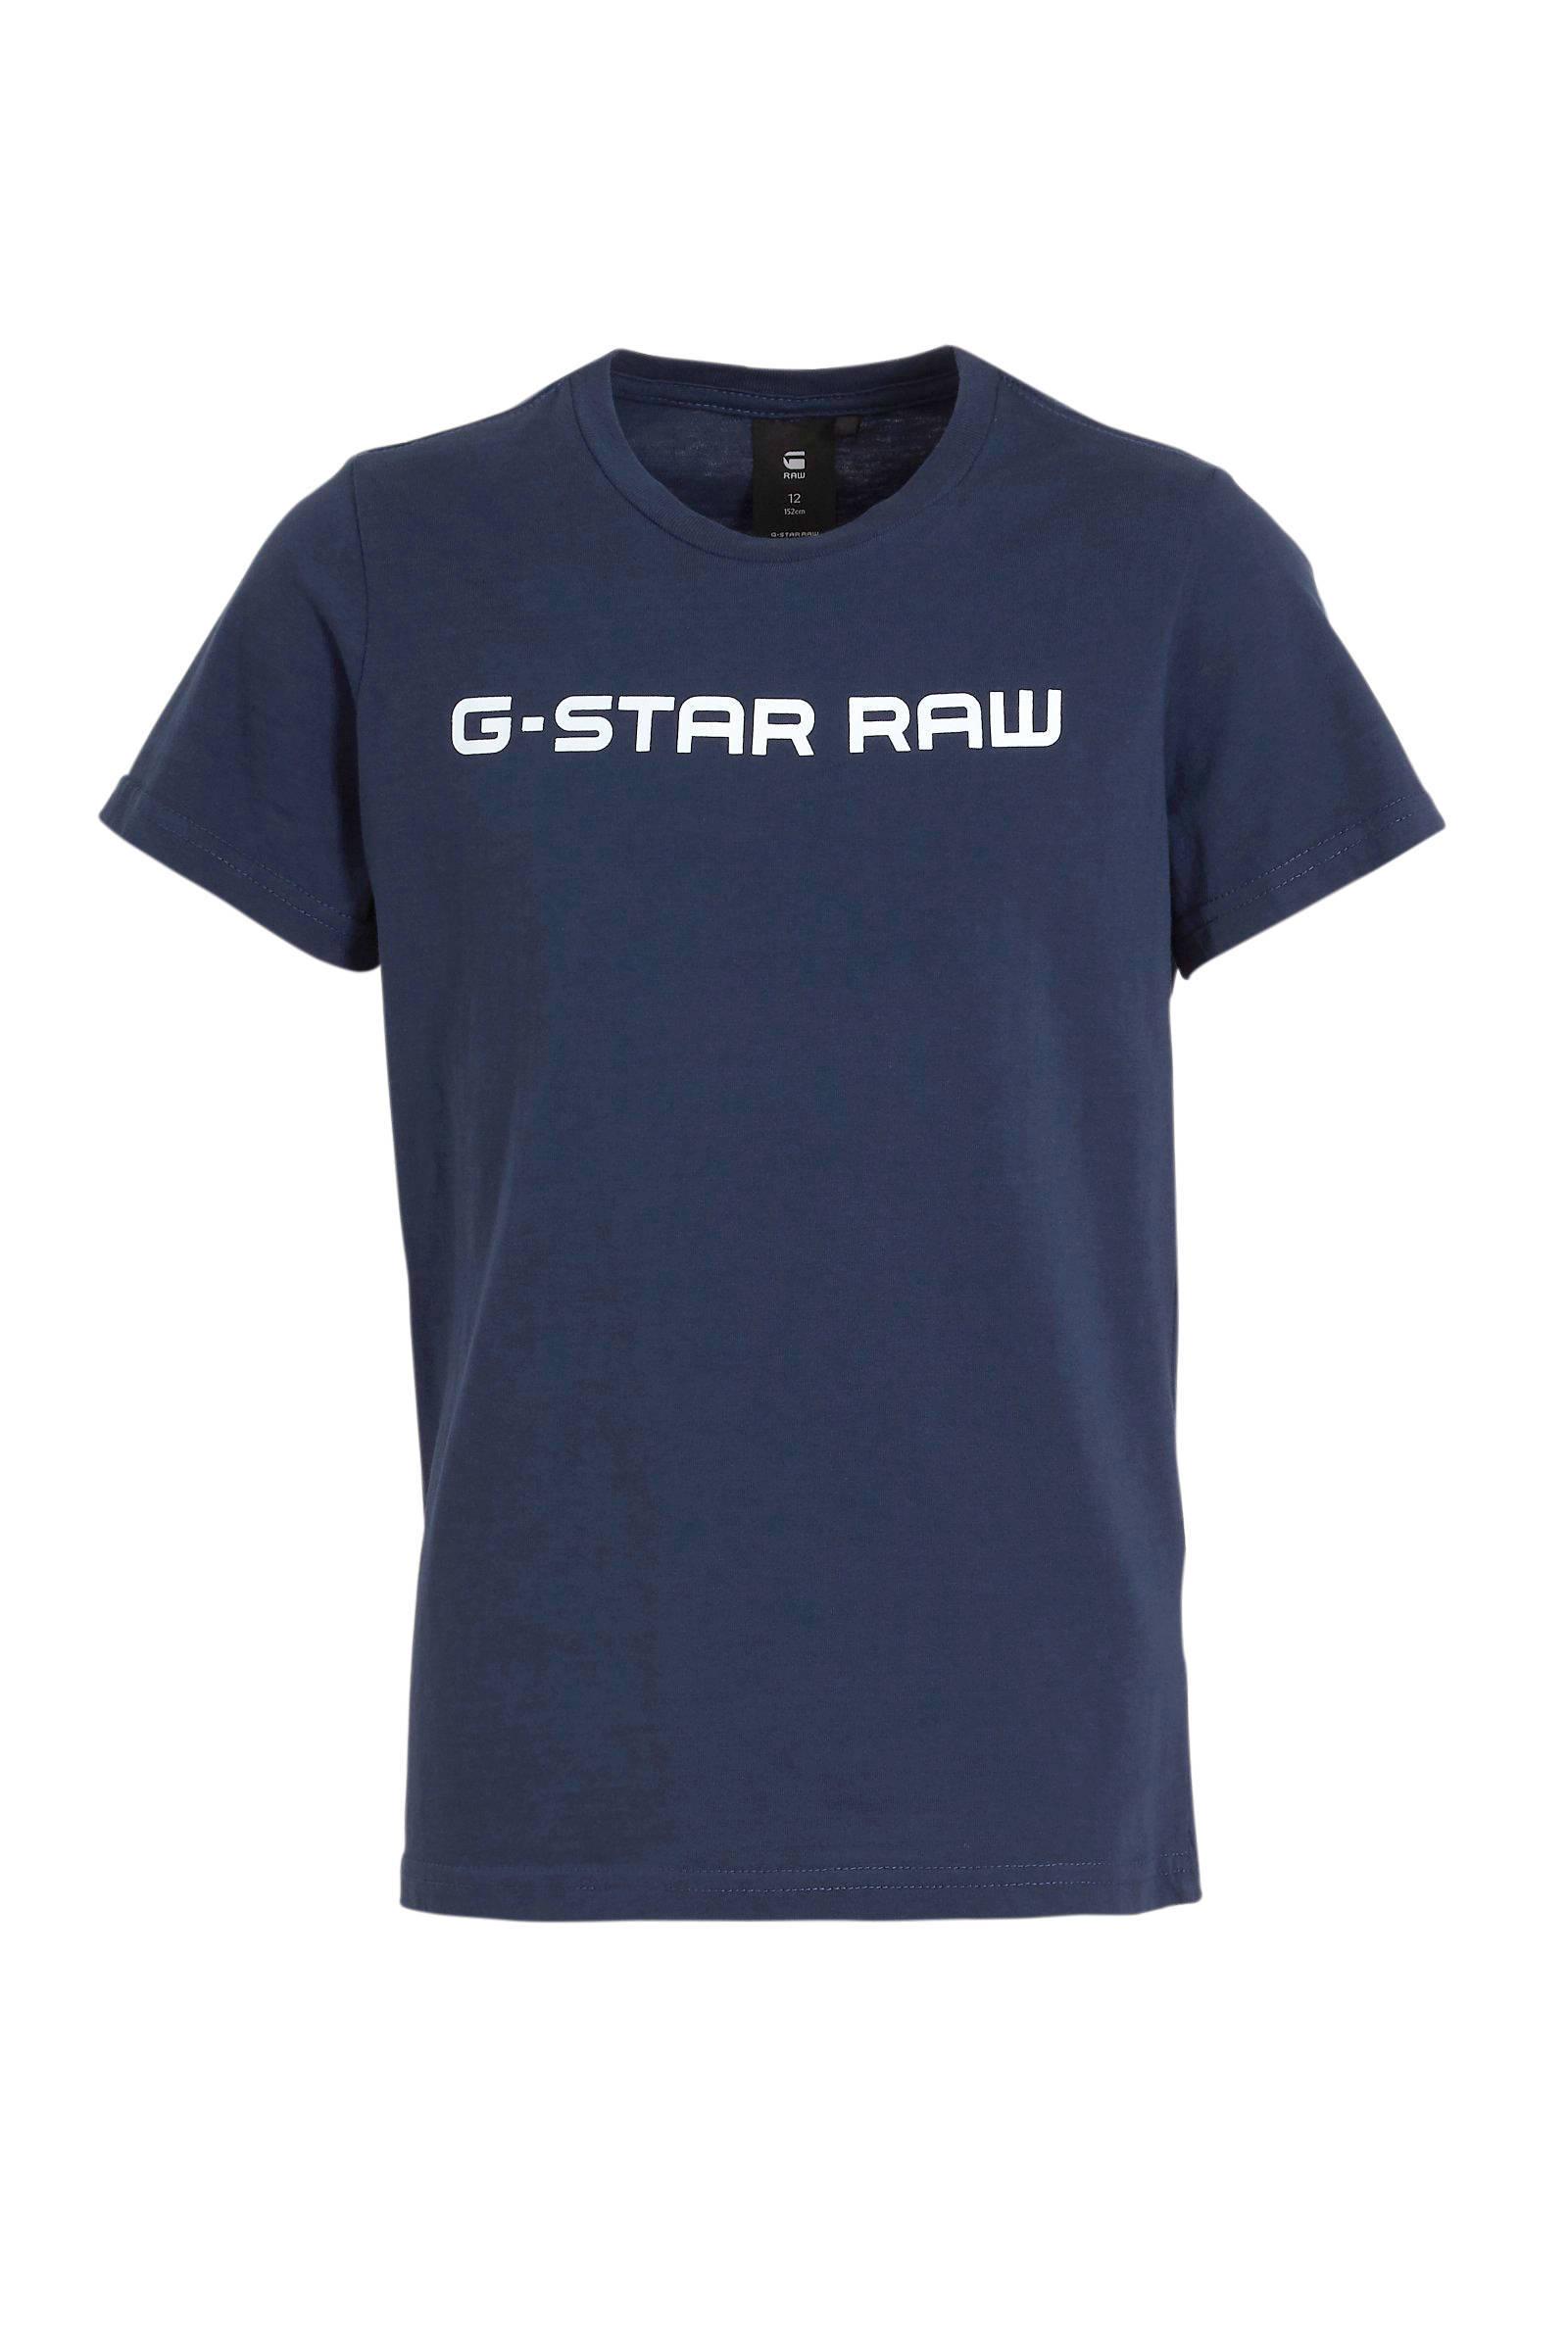 296 Best G star RAW images in 2020   G star raw, Fashion